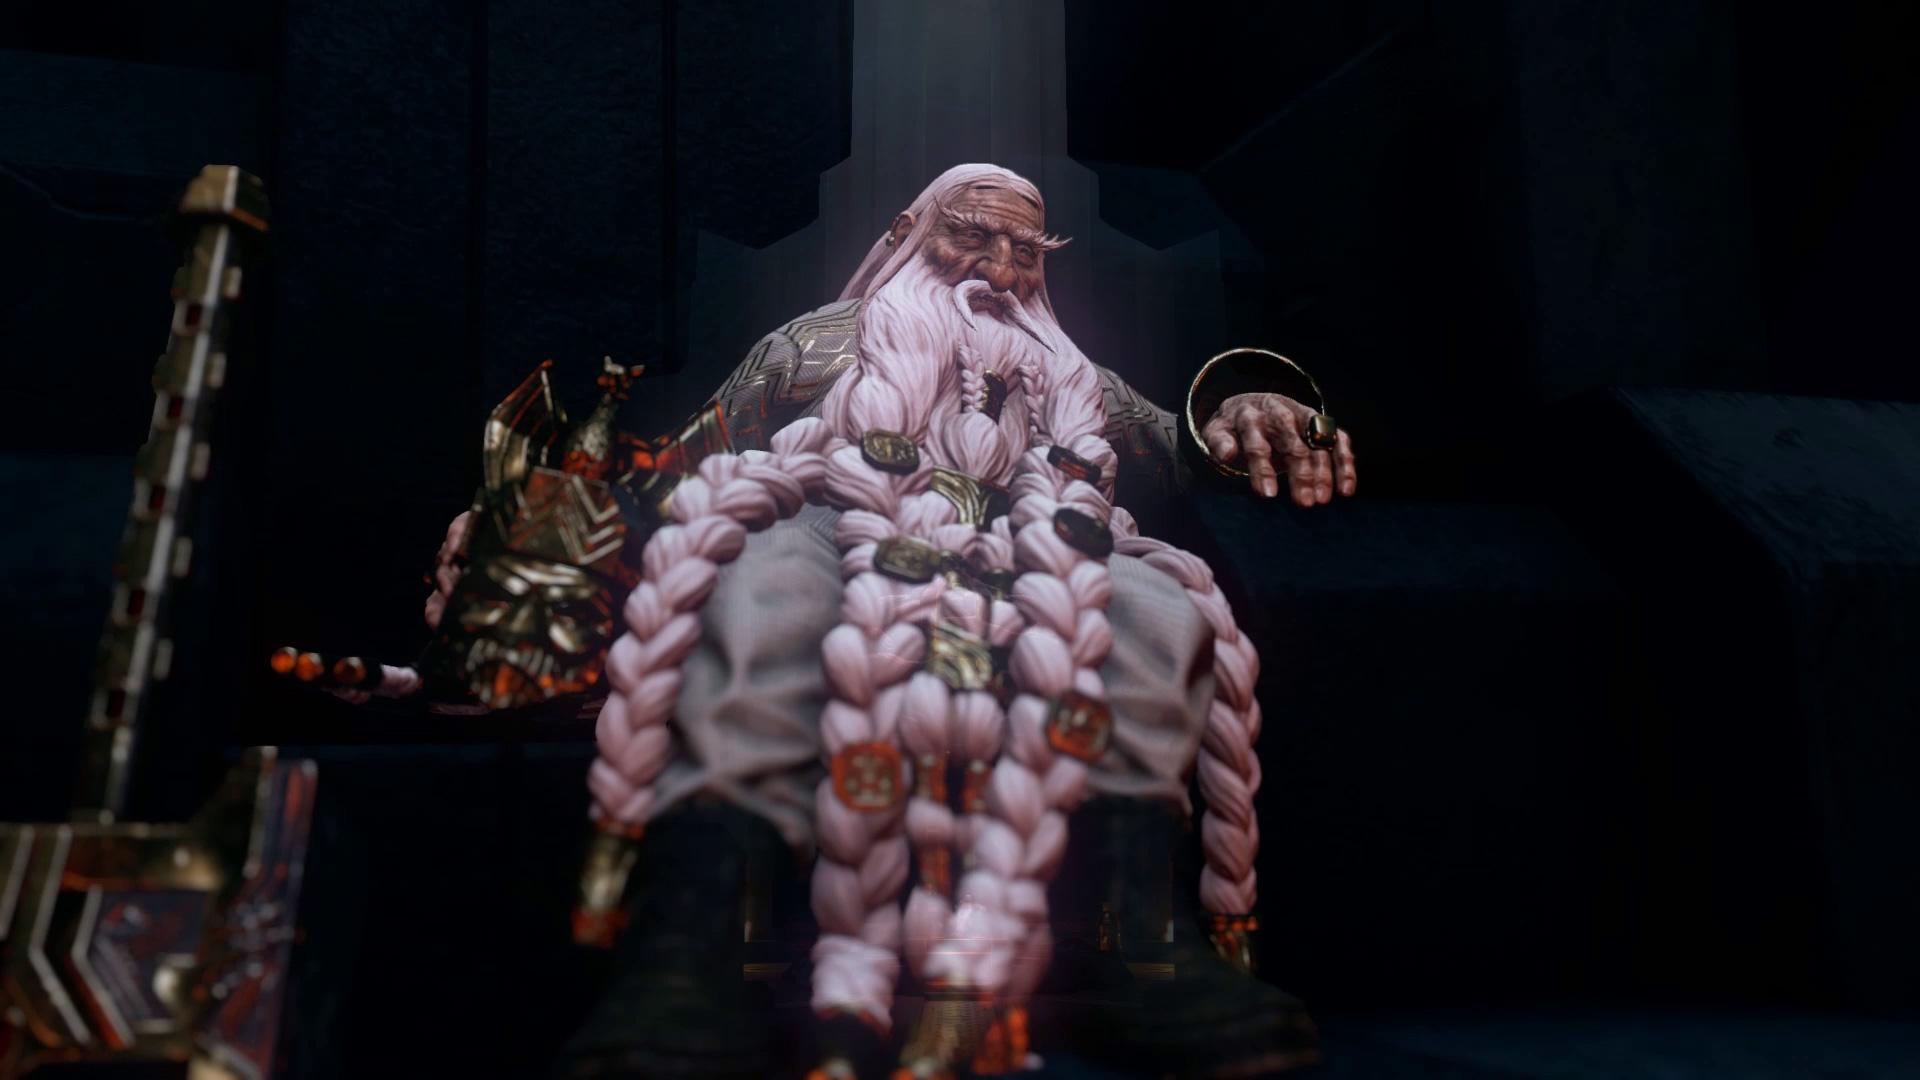 The Dwarves Beard